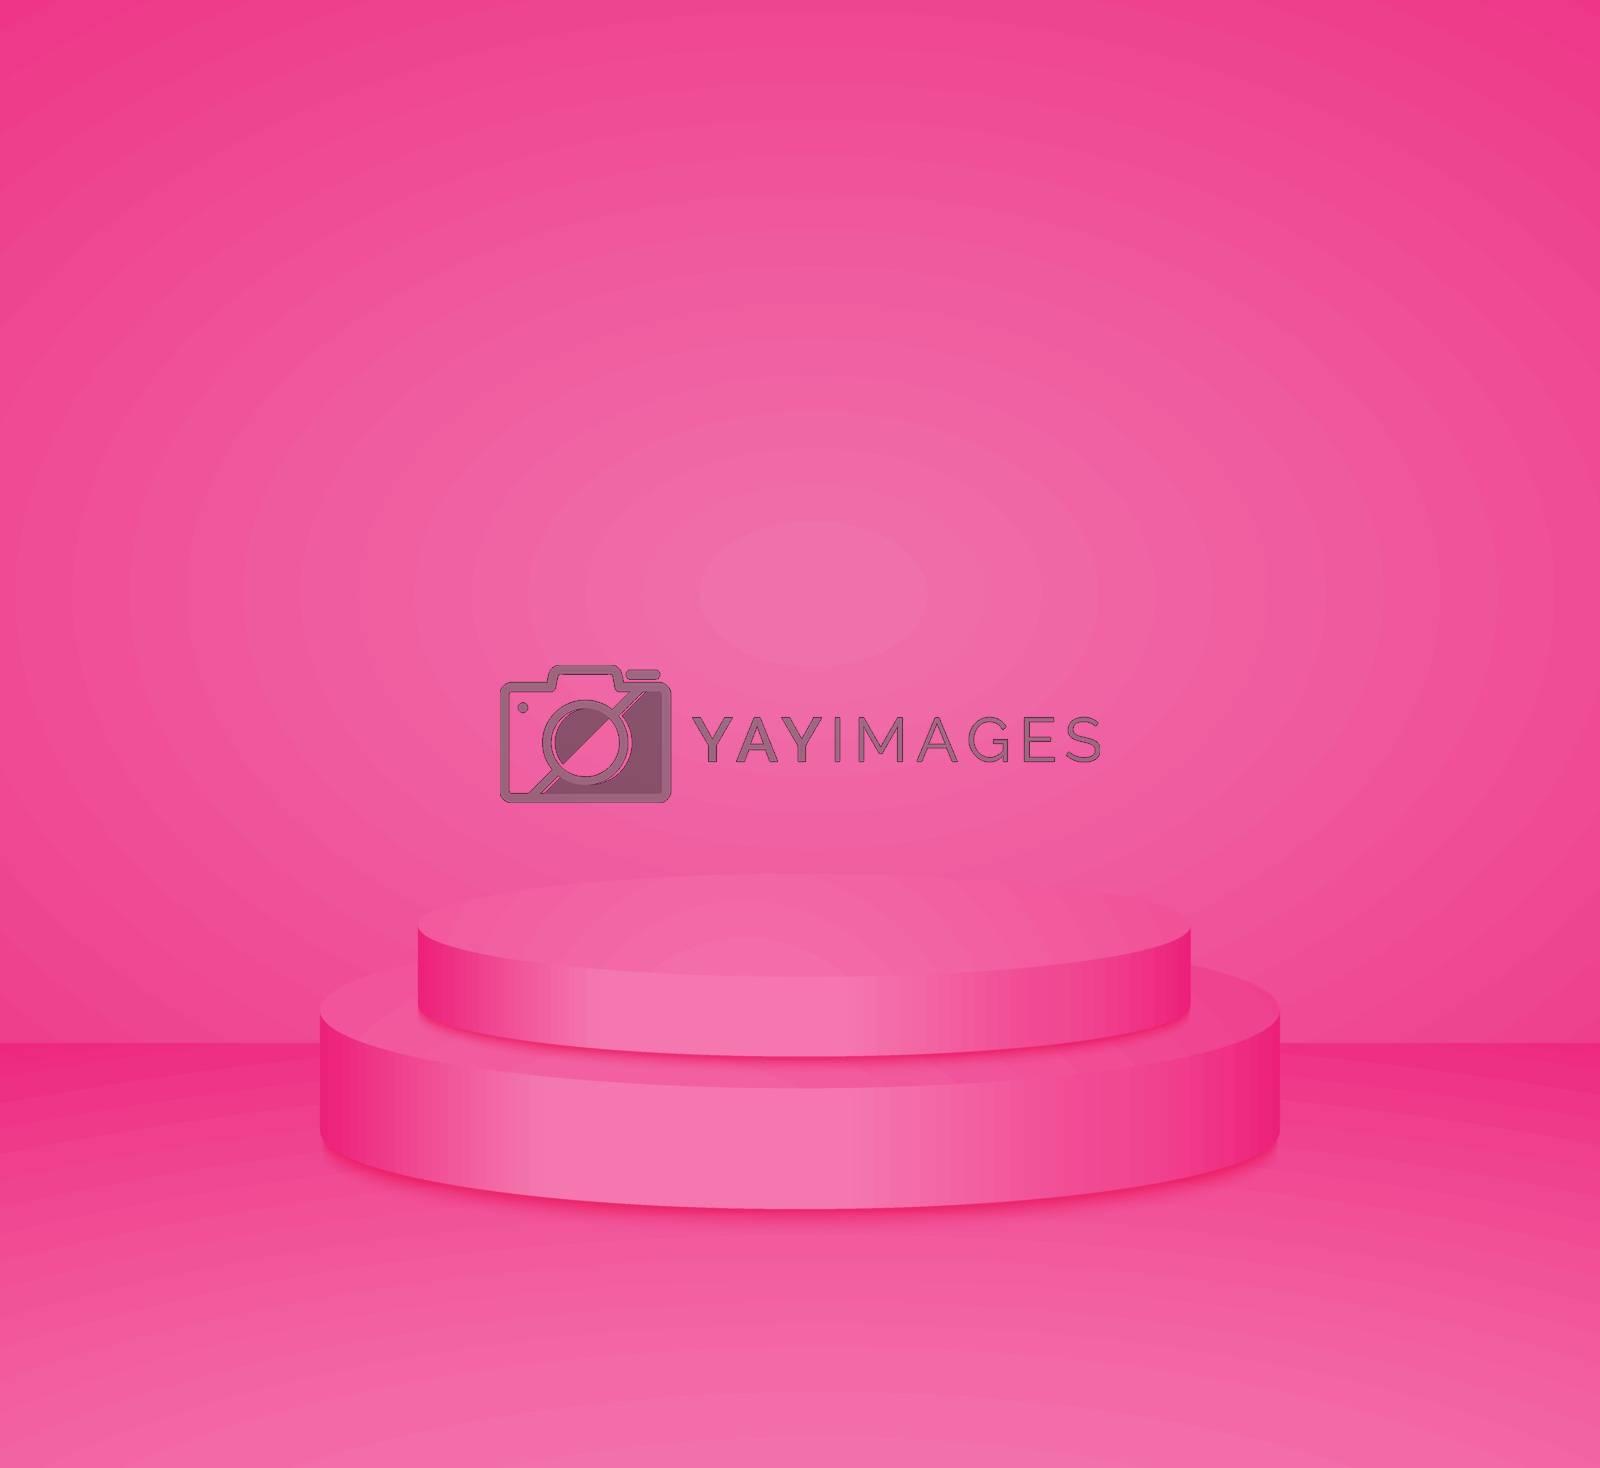 3d pink cylinder podium minimal studio background. Abstract 3d geometric shape object illustration render Display